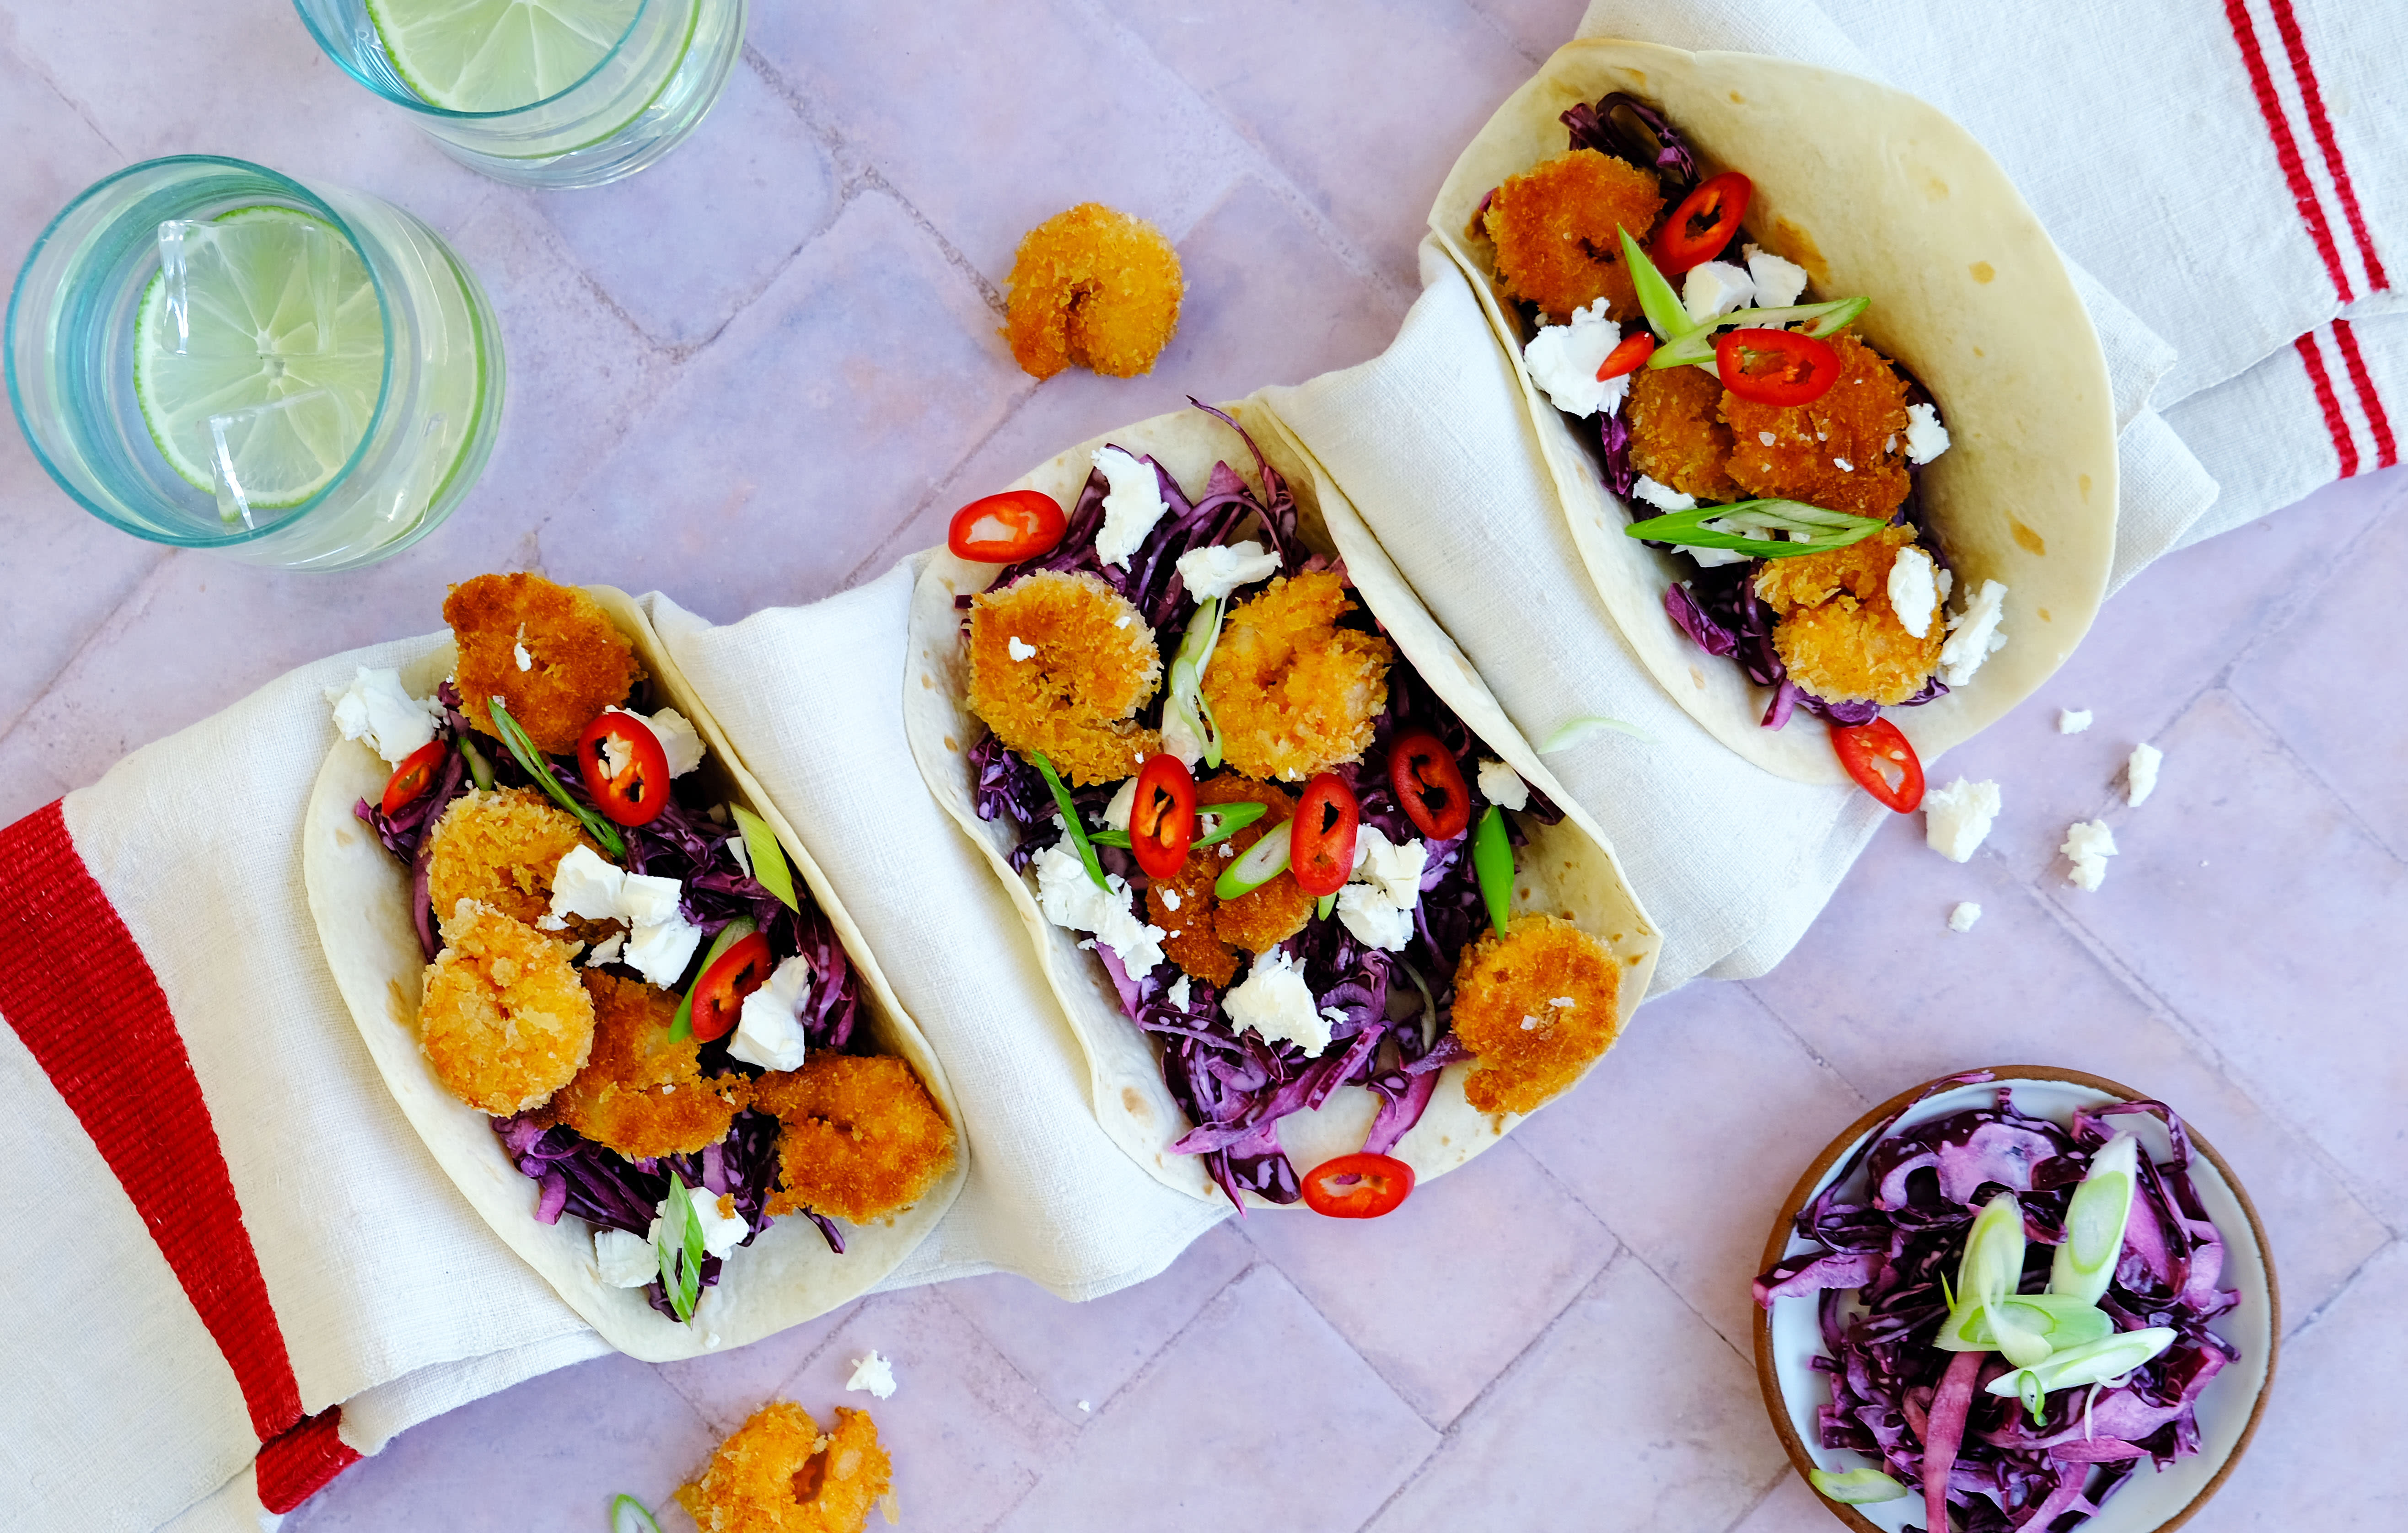 Crispy Prawns and Slaw Tacos with Feta